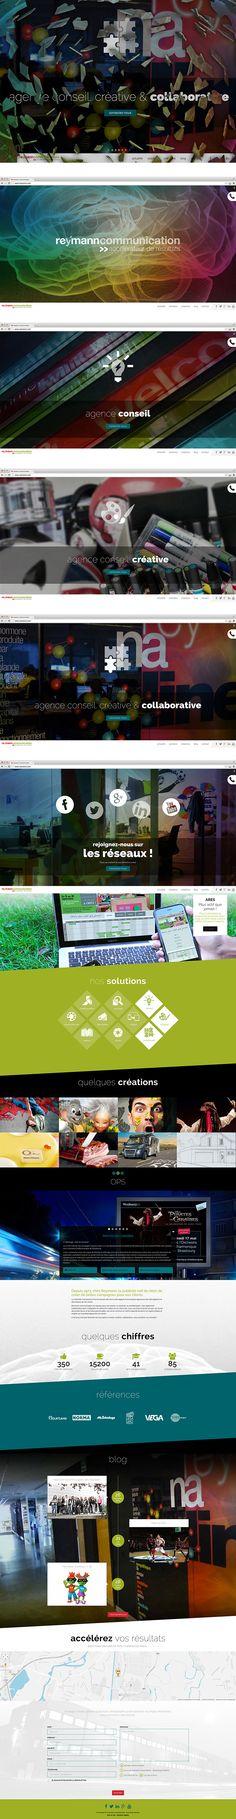 http://www.reymann.com UX, UI, Responsive & Parallax Digital Design